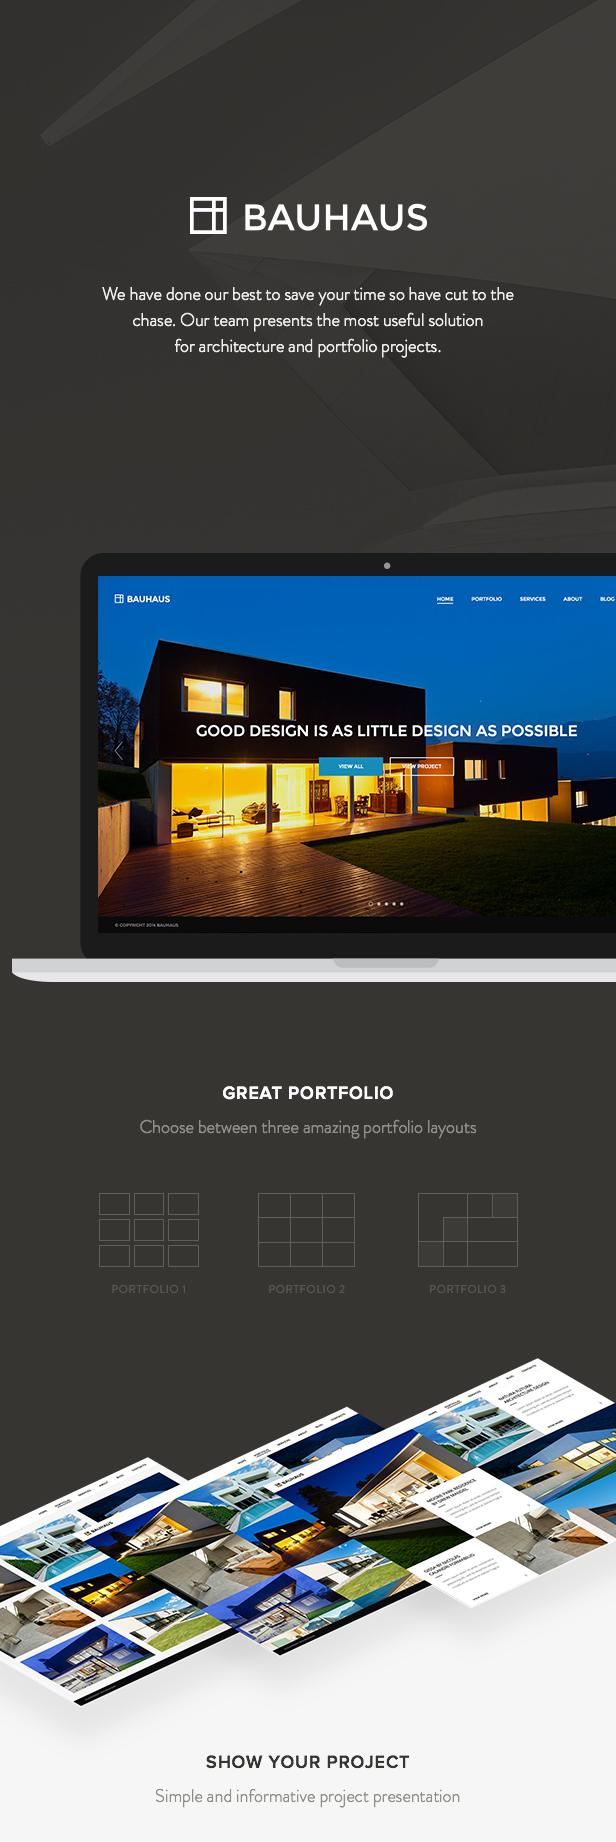 Bauhaus - Tema de WordPress Arquitectura y portafolio - 1